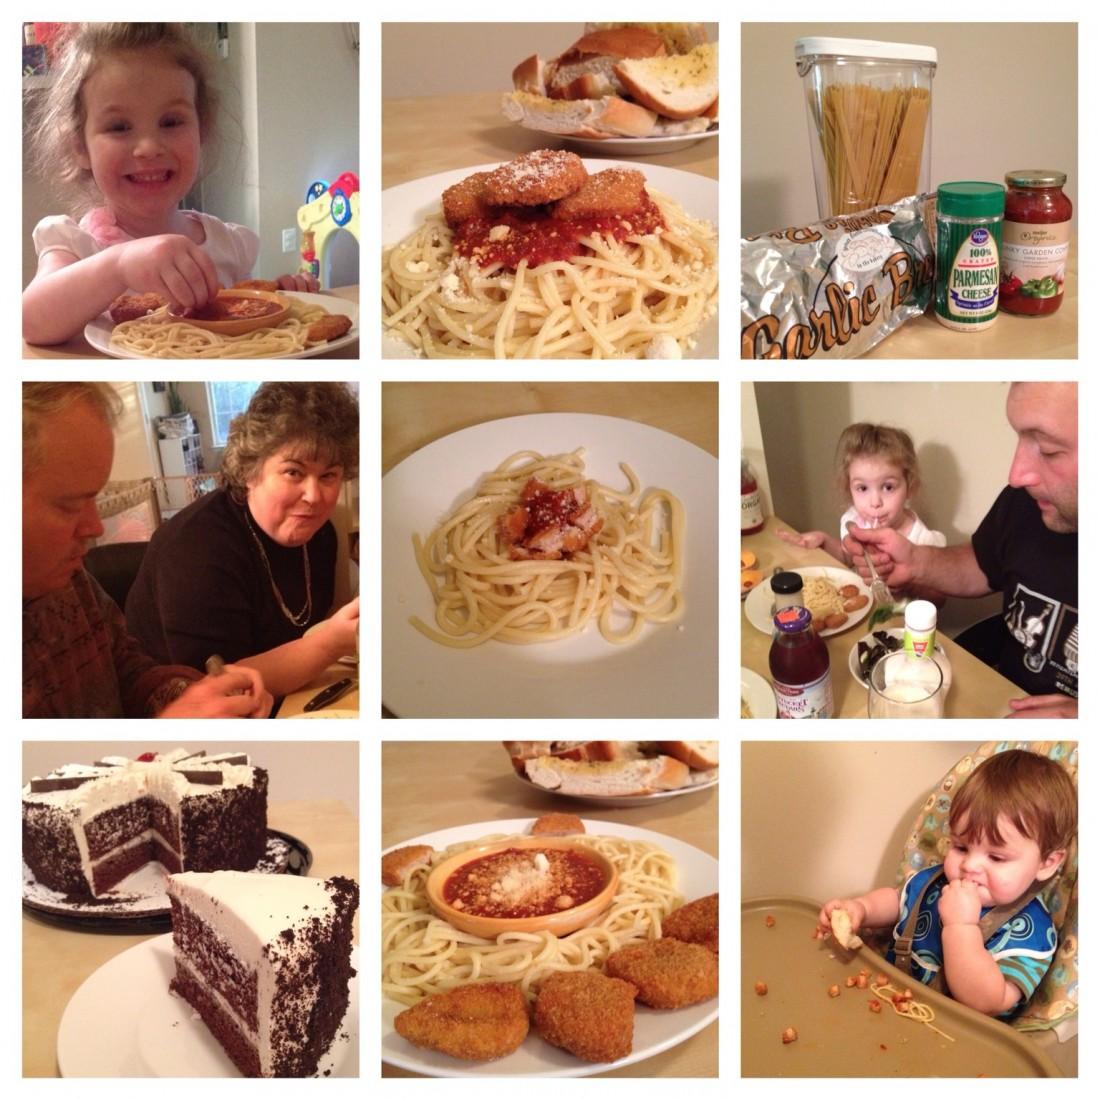 #DipDipHooray Dinner